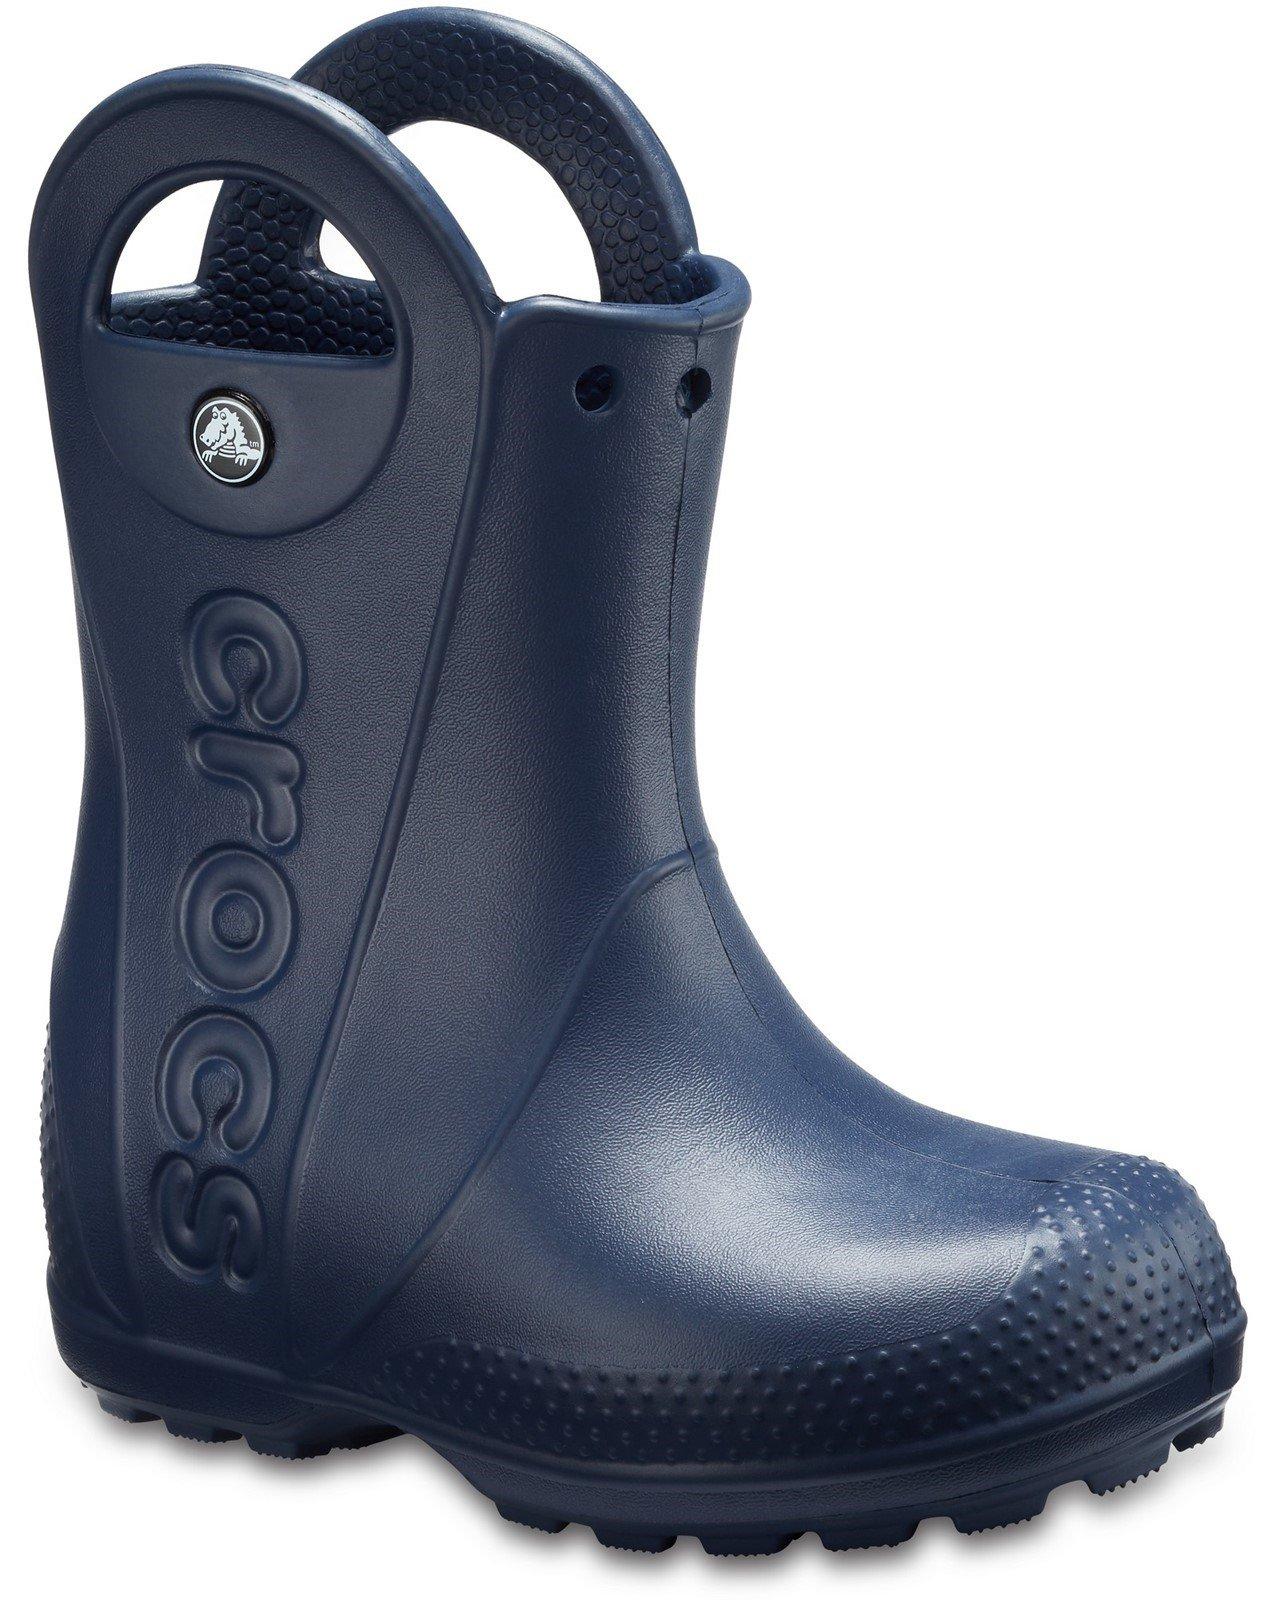 Crocs Kid's Rain Boot Various Colours 21080 - Navy 6 UK